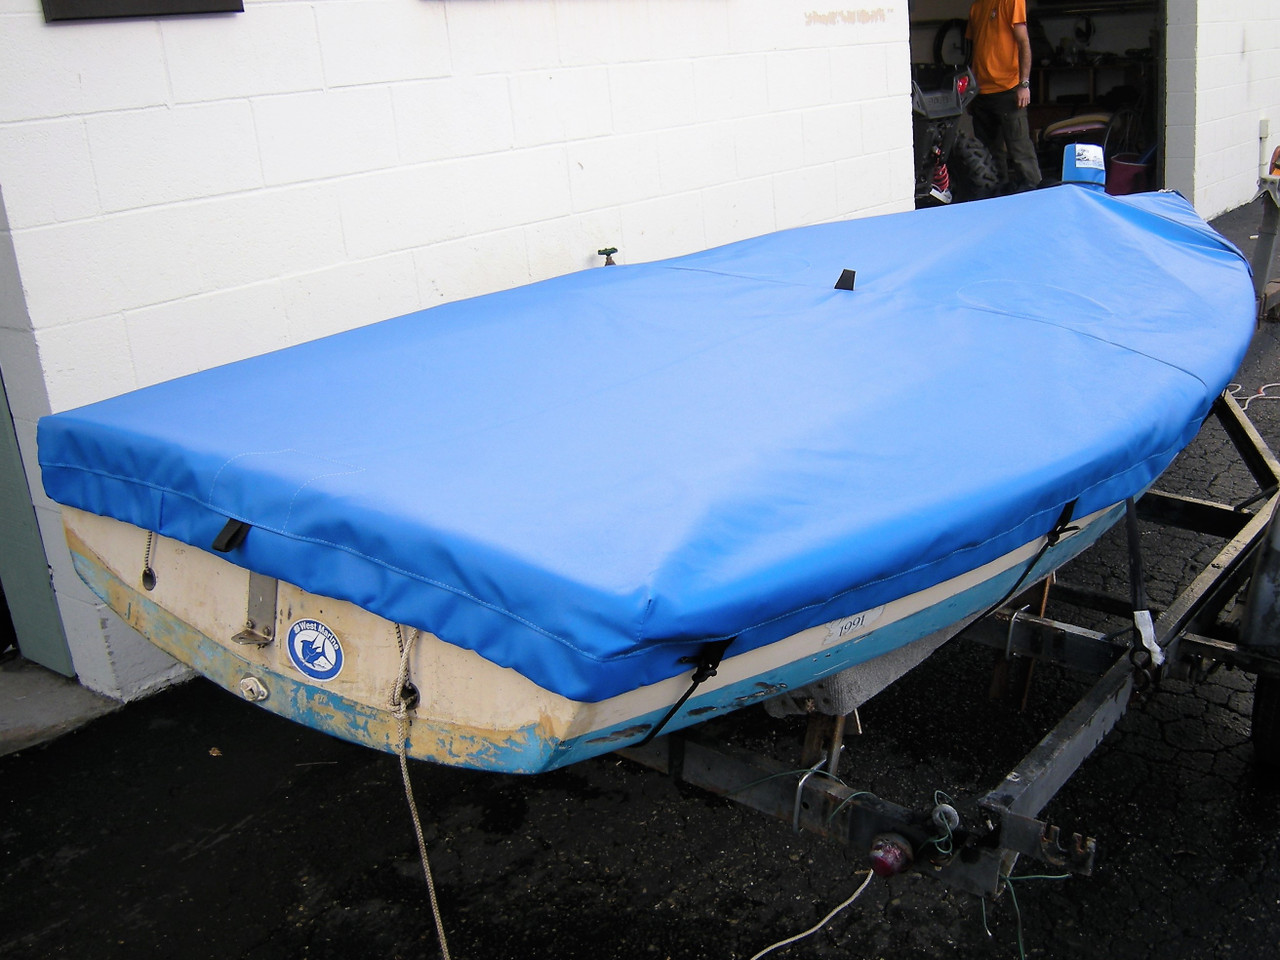 Capri Cyclone sailboat Mast Up Flat Cover by SLO Sail and Canvas